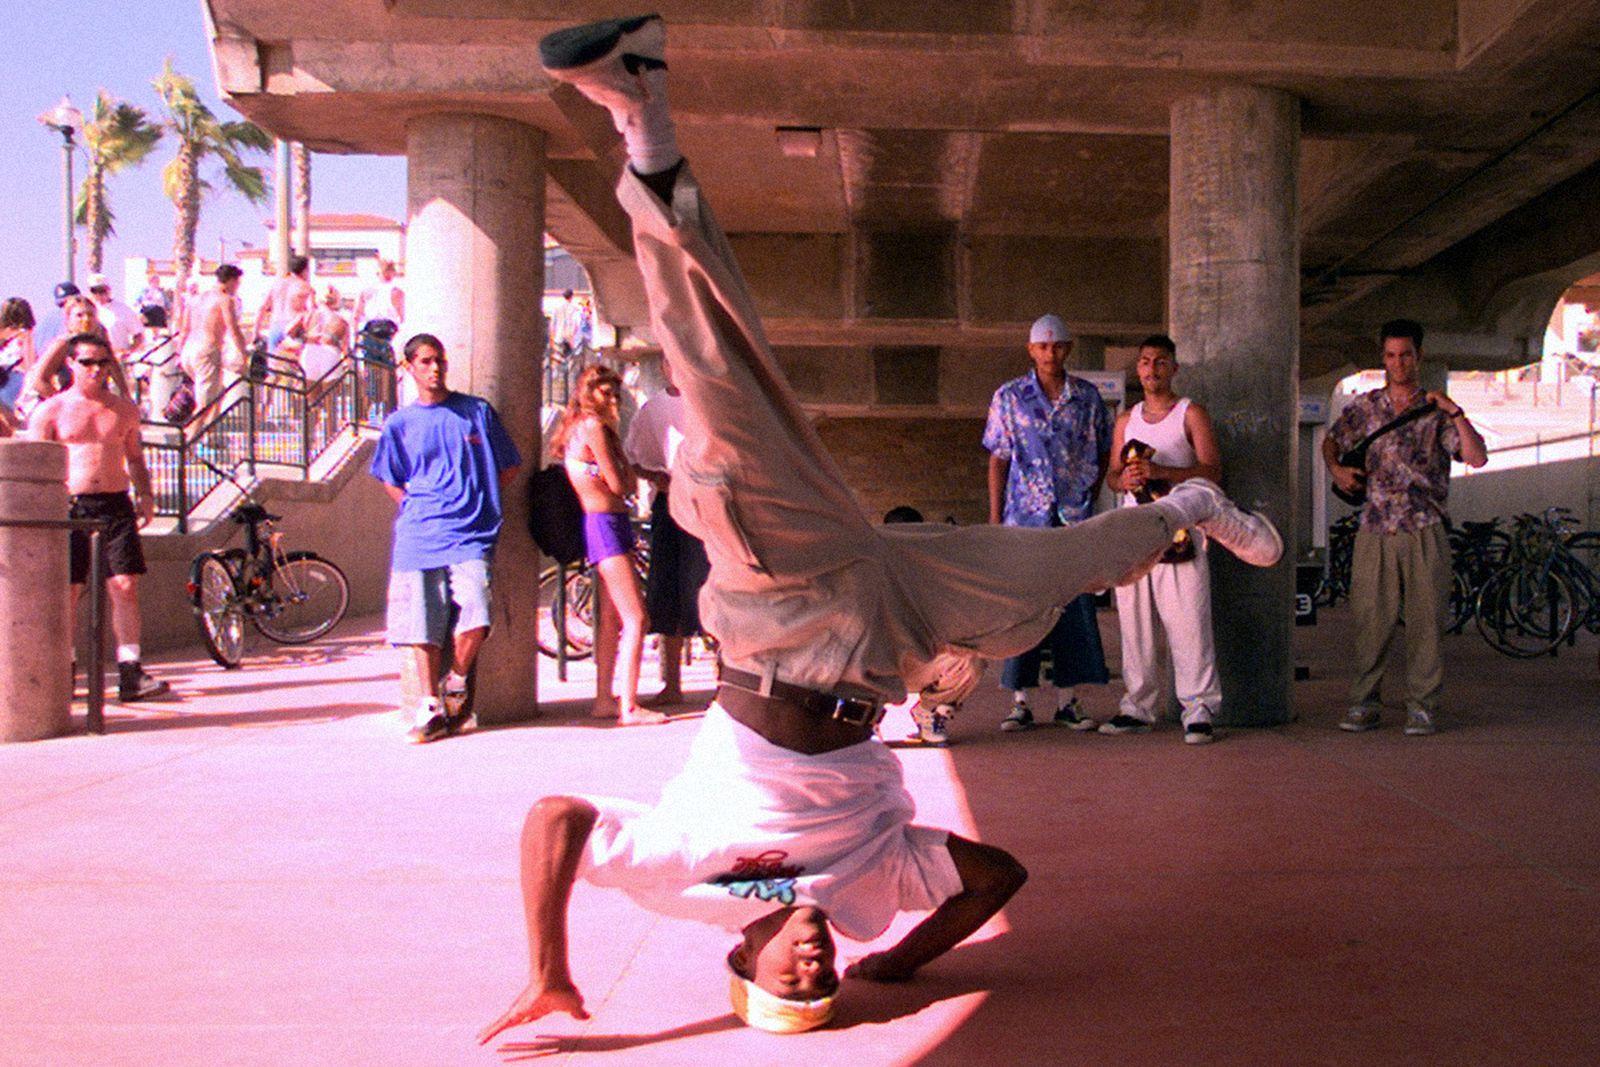 breakdancing-olypmic-sport-main